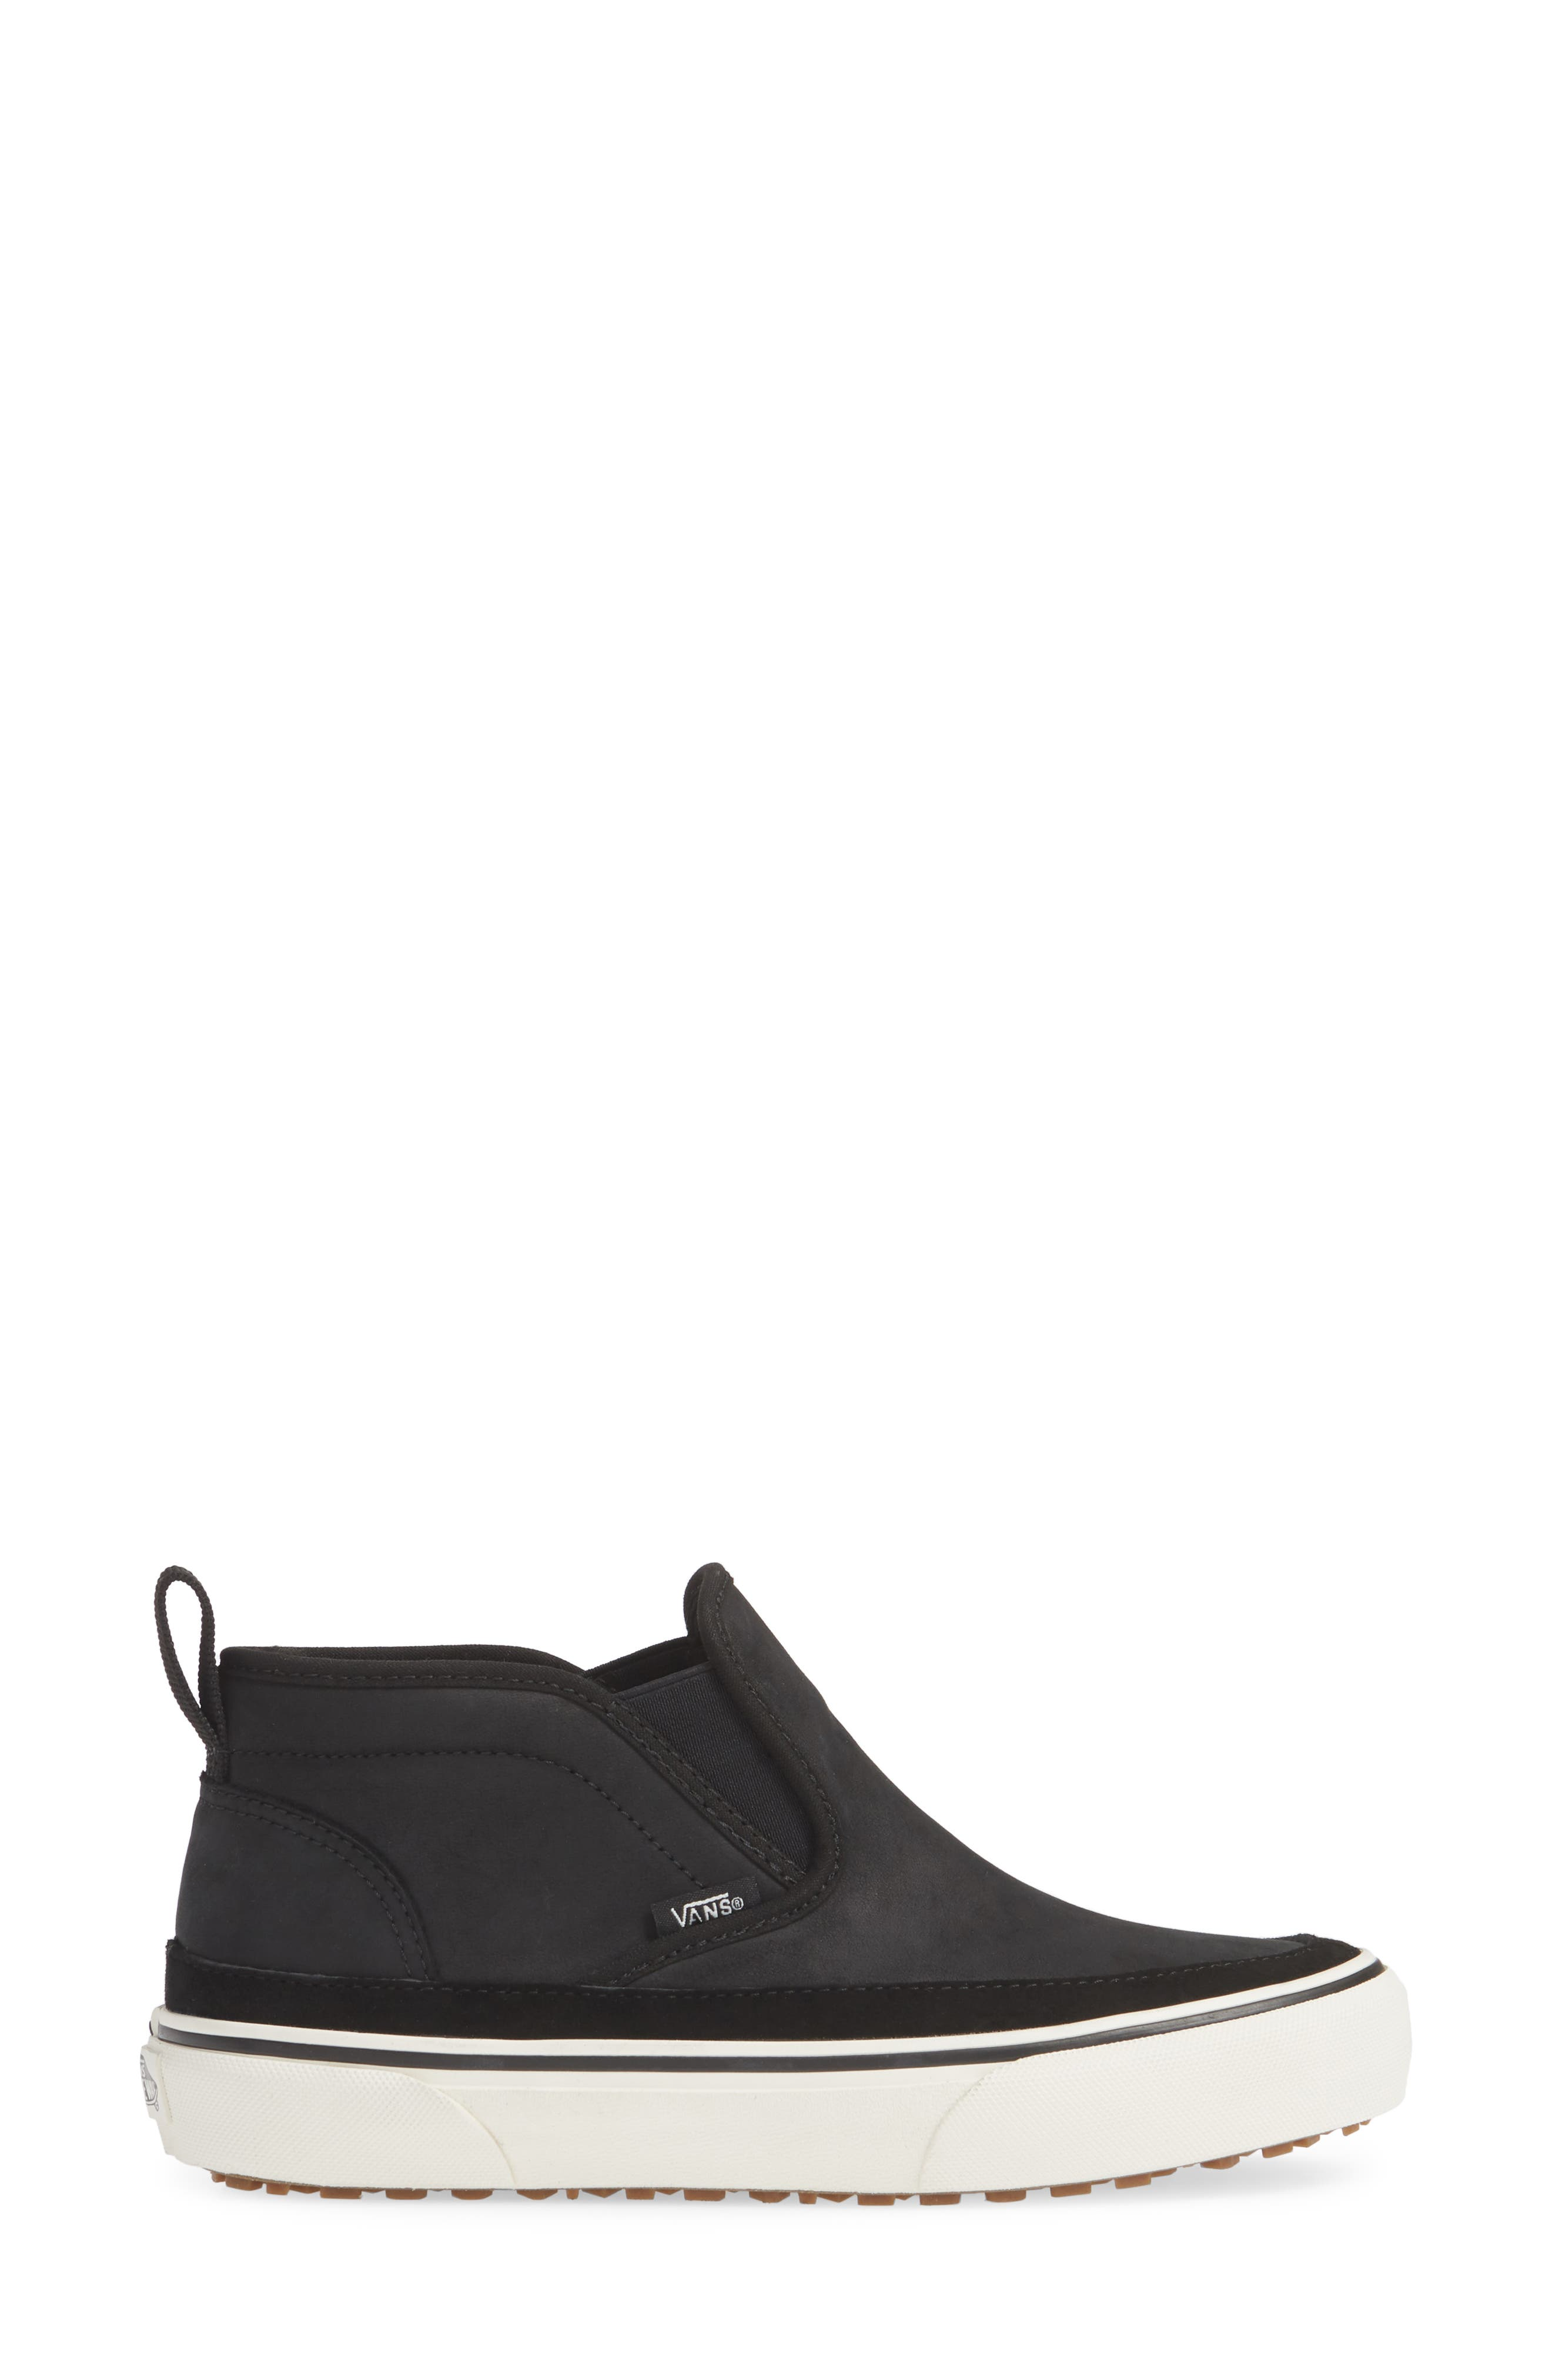 UA Authentic MTE Slip-On Sneaker,                             Alternate thumbnail 3, color,                             BLACK/ MARSHMALLOW